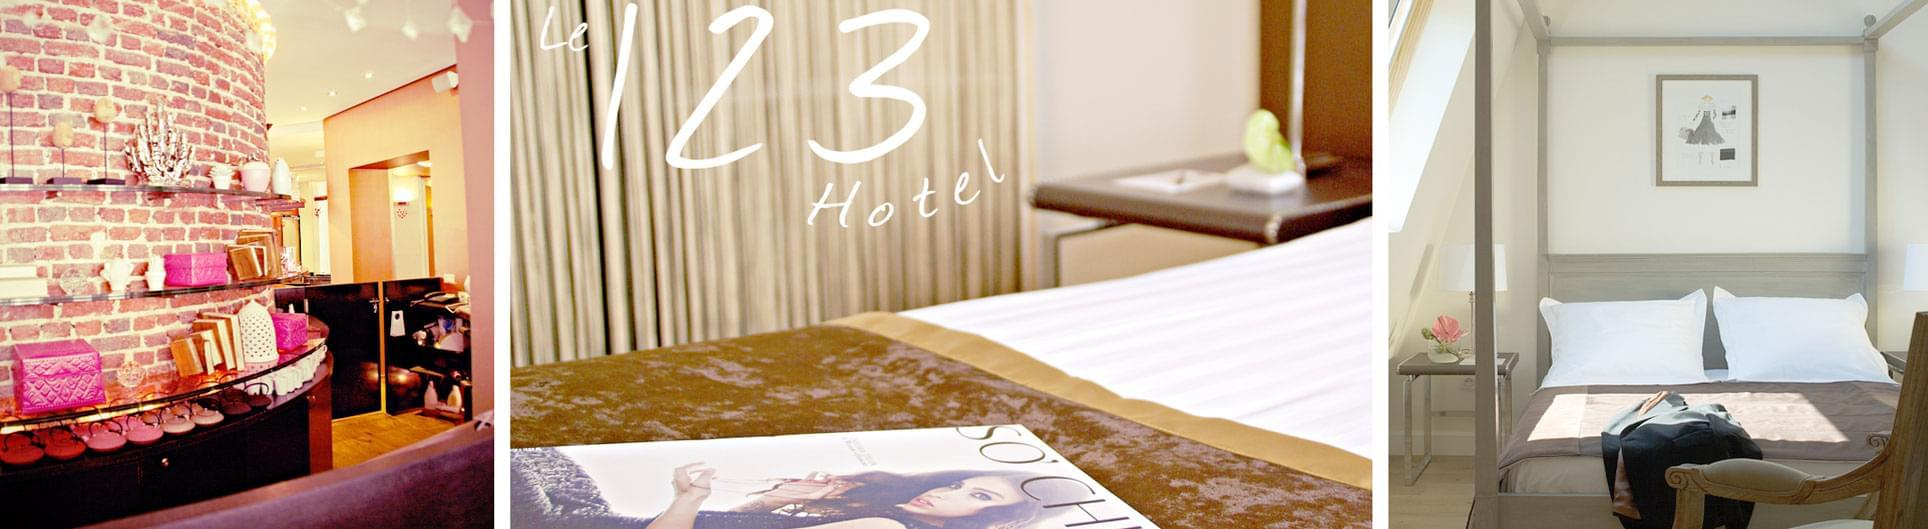 Astotel Le 123 Elysees - 4-star Hotel Paris